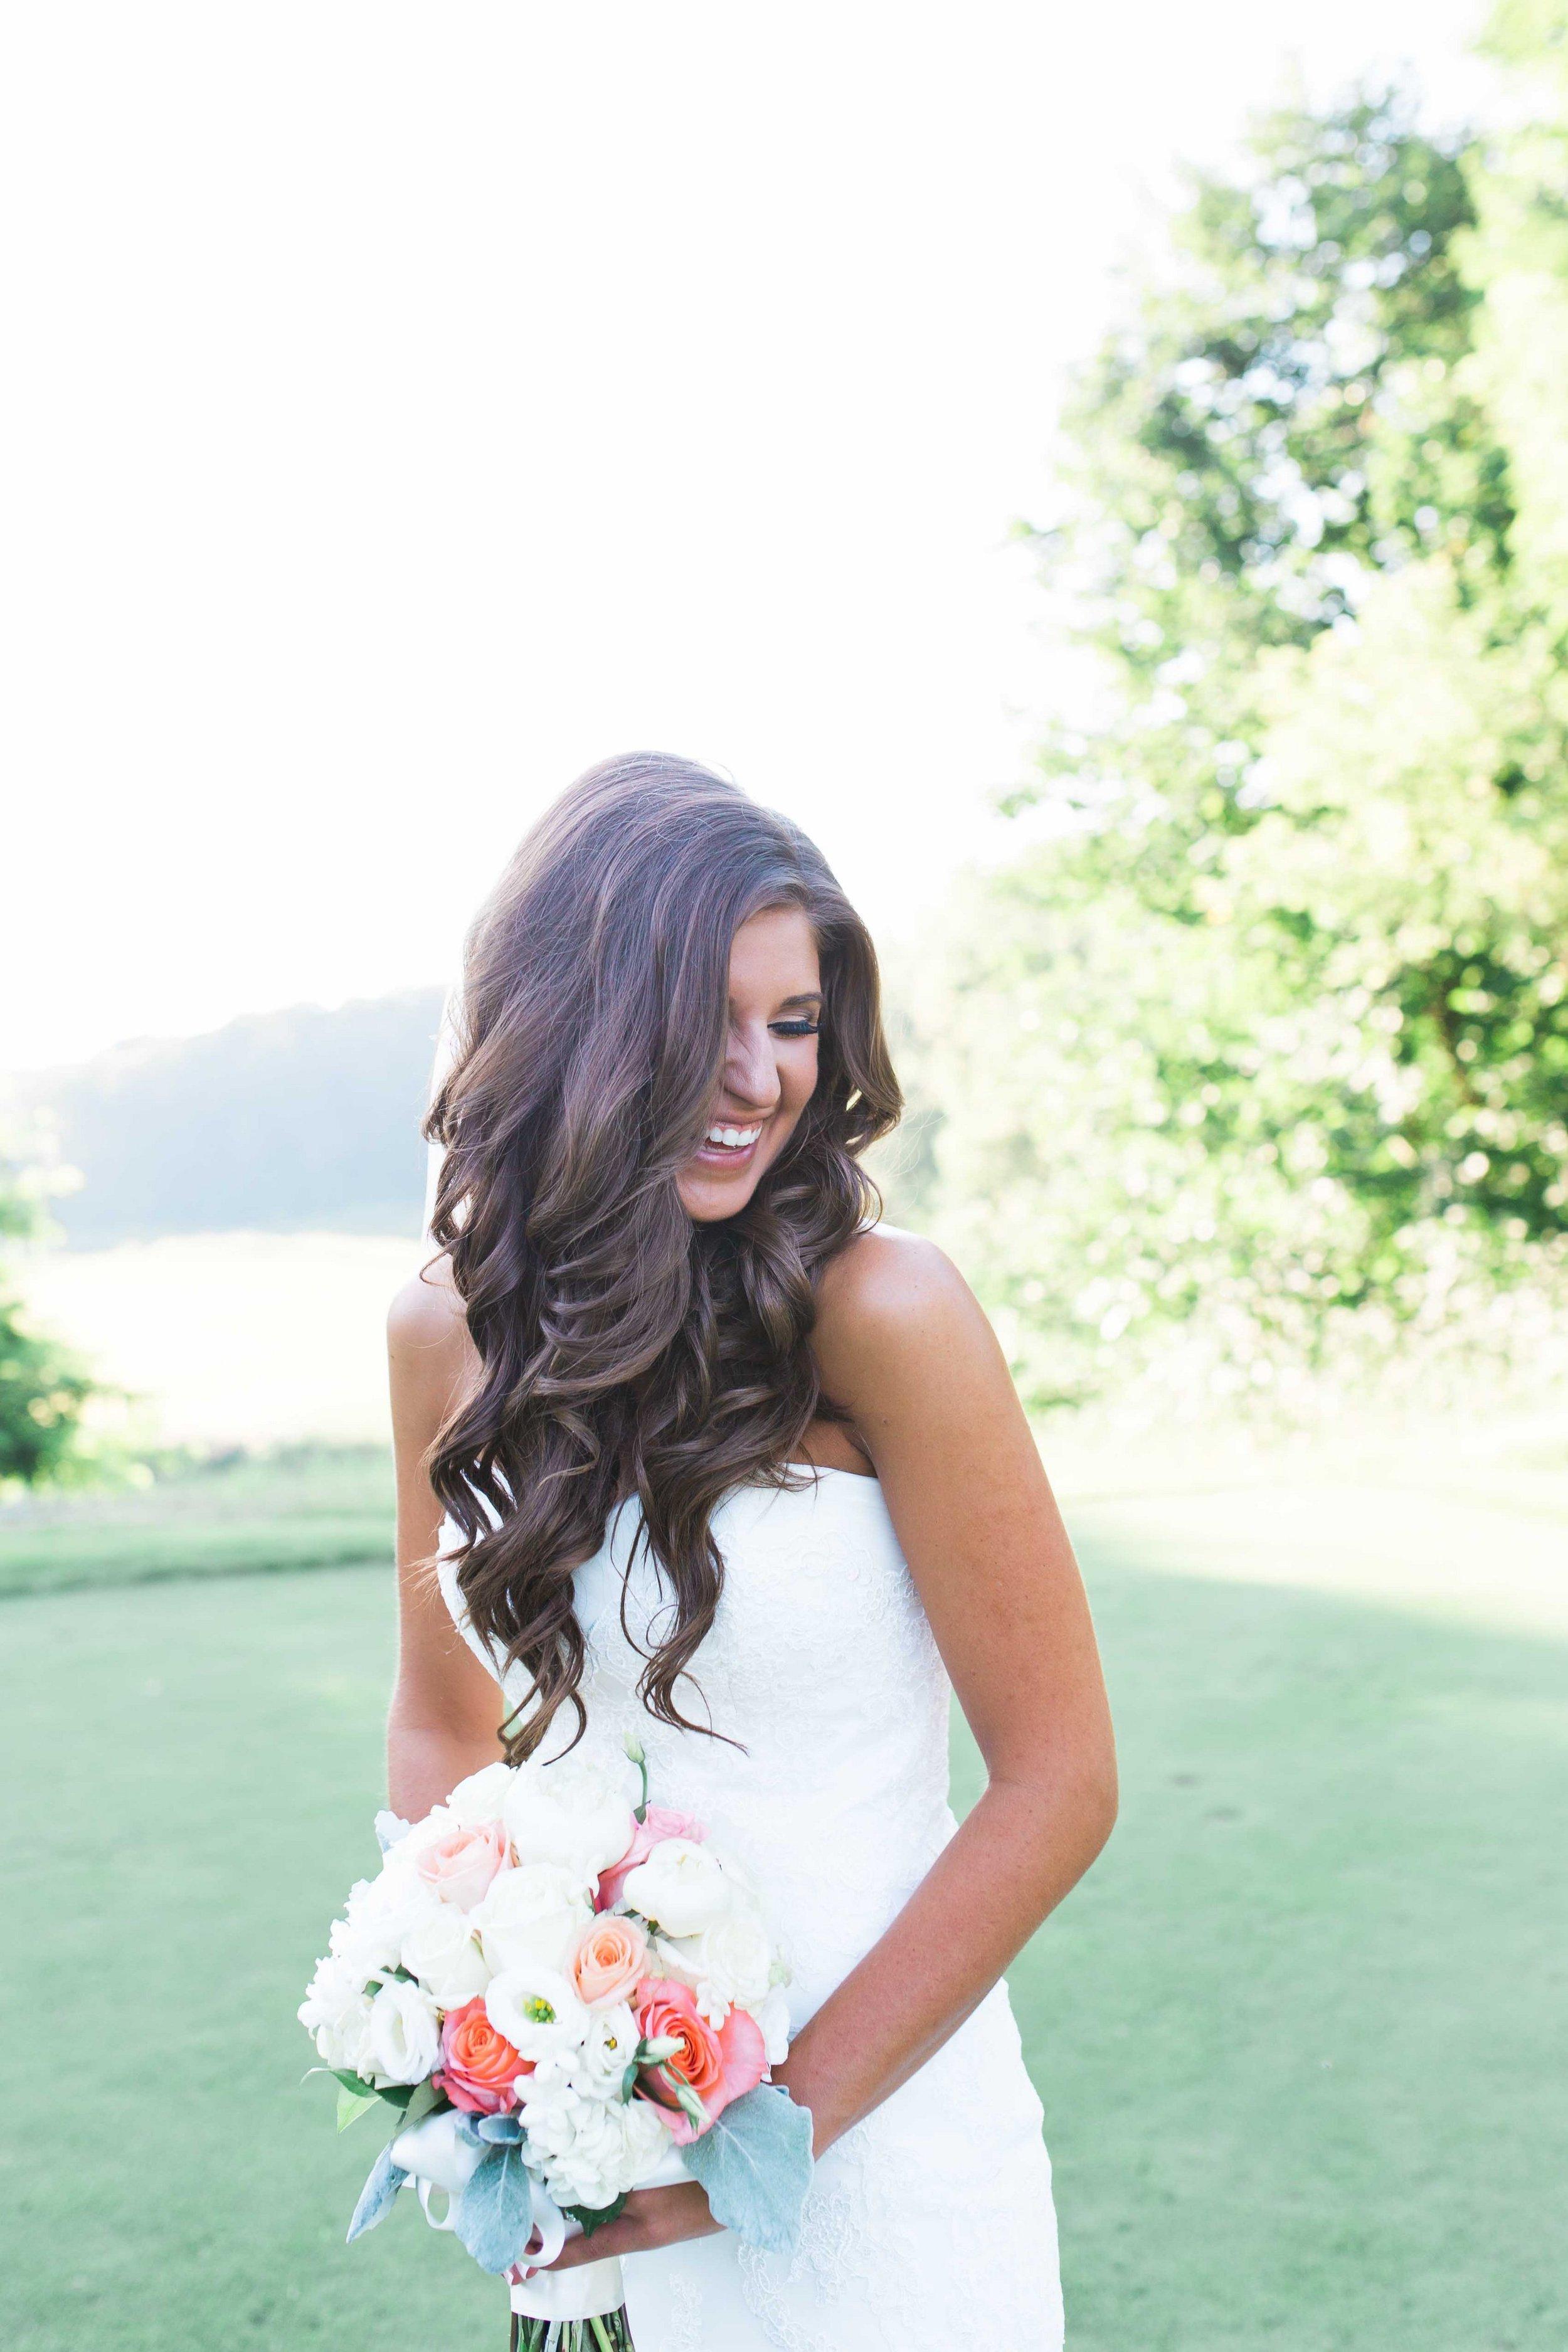 Photo: Lindsey Kay Photography   Bride: Chrissy P.